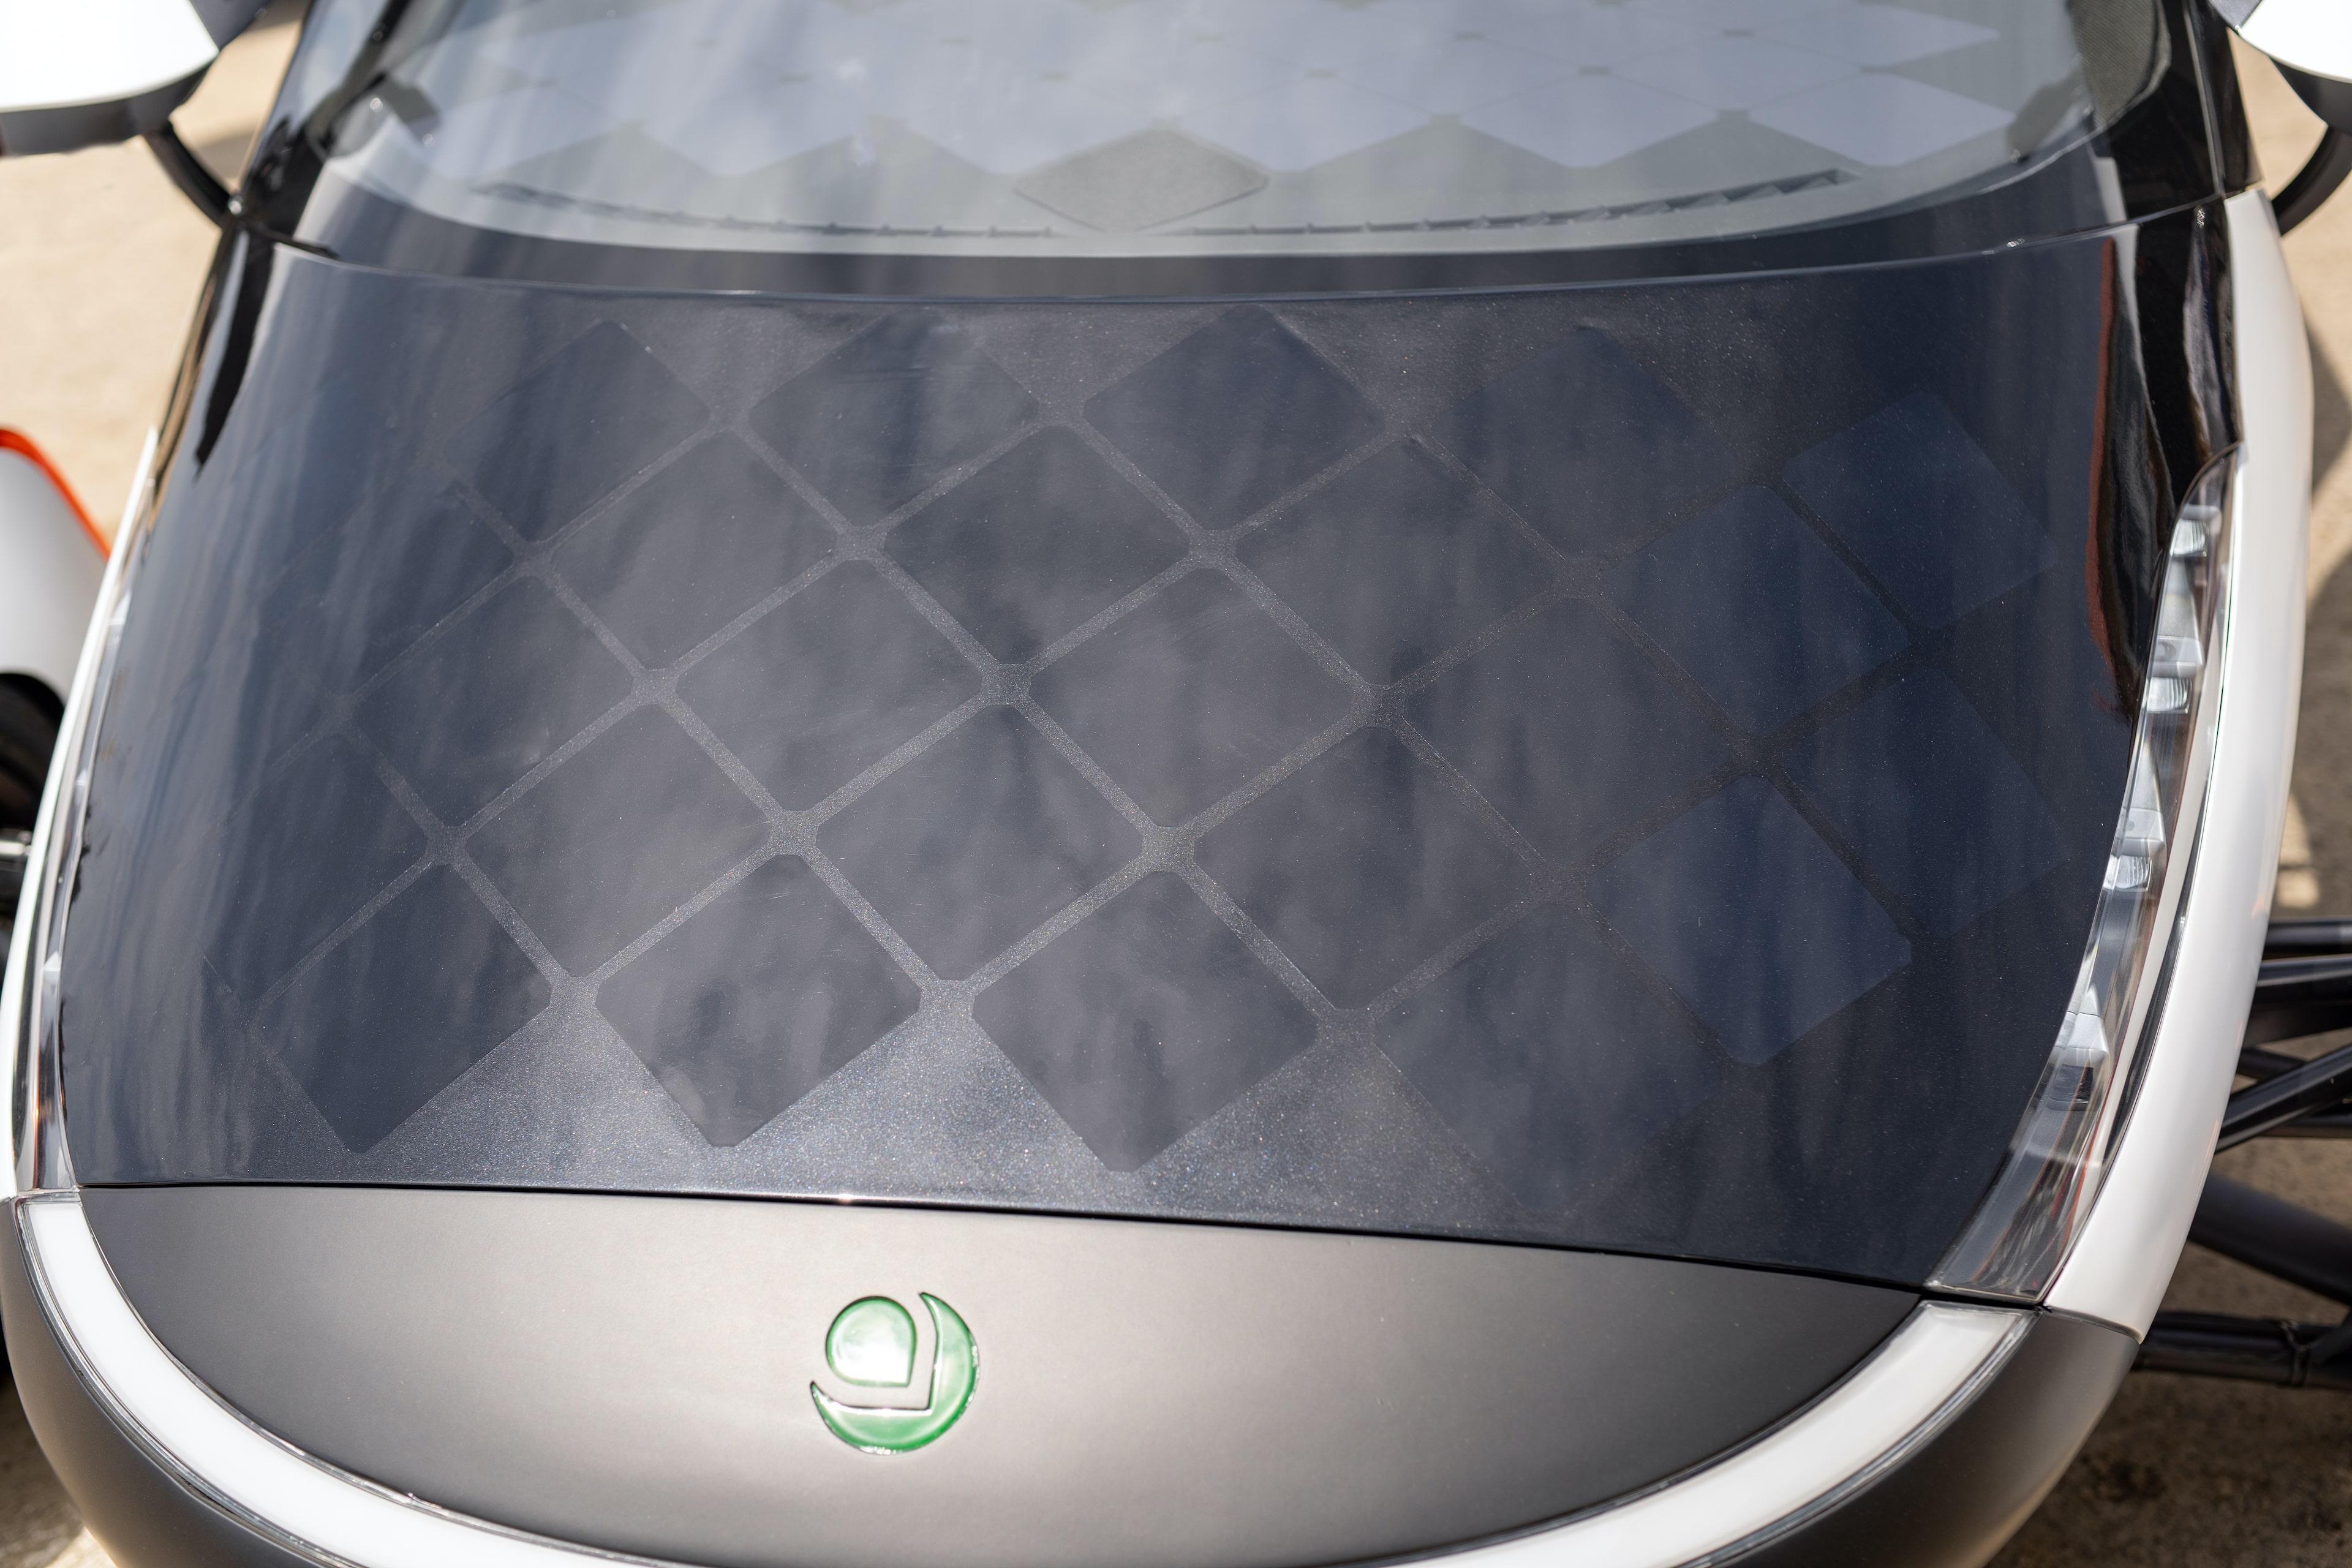 Image of Aptera's Solar Electric Vehicle